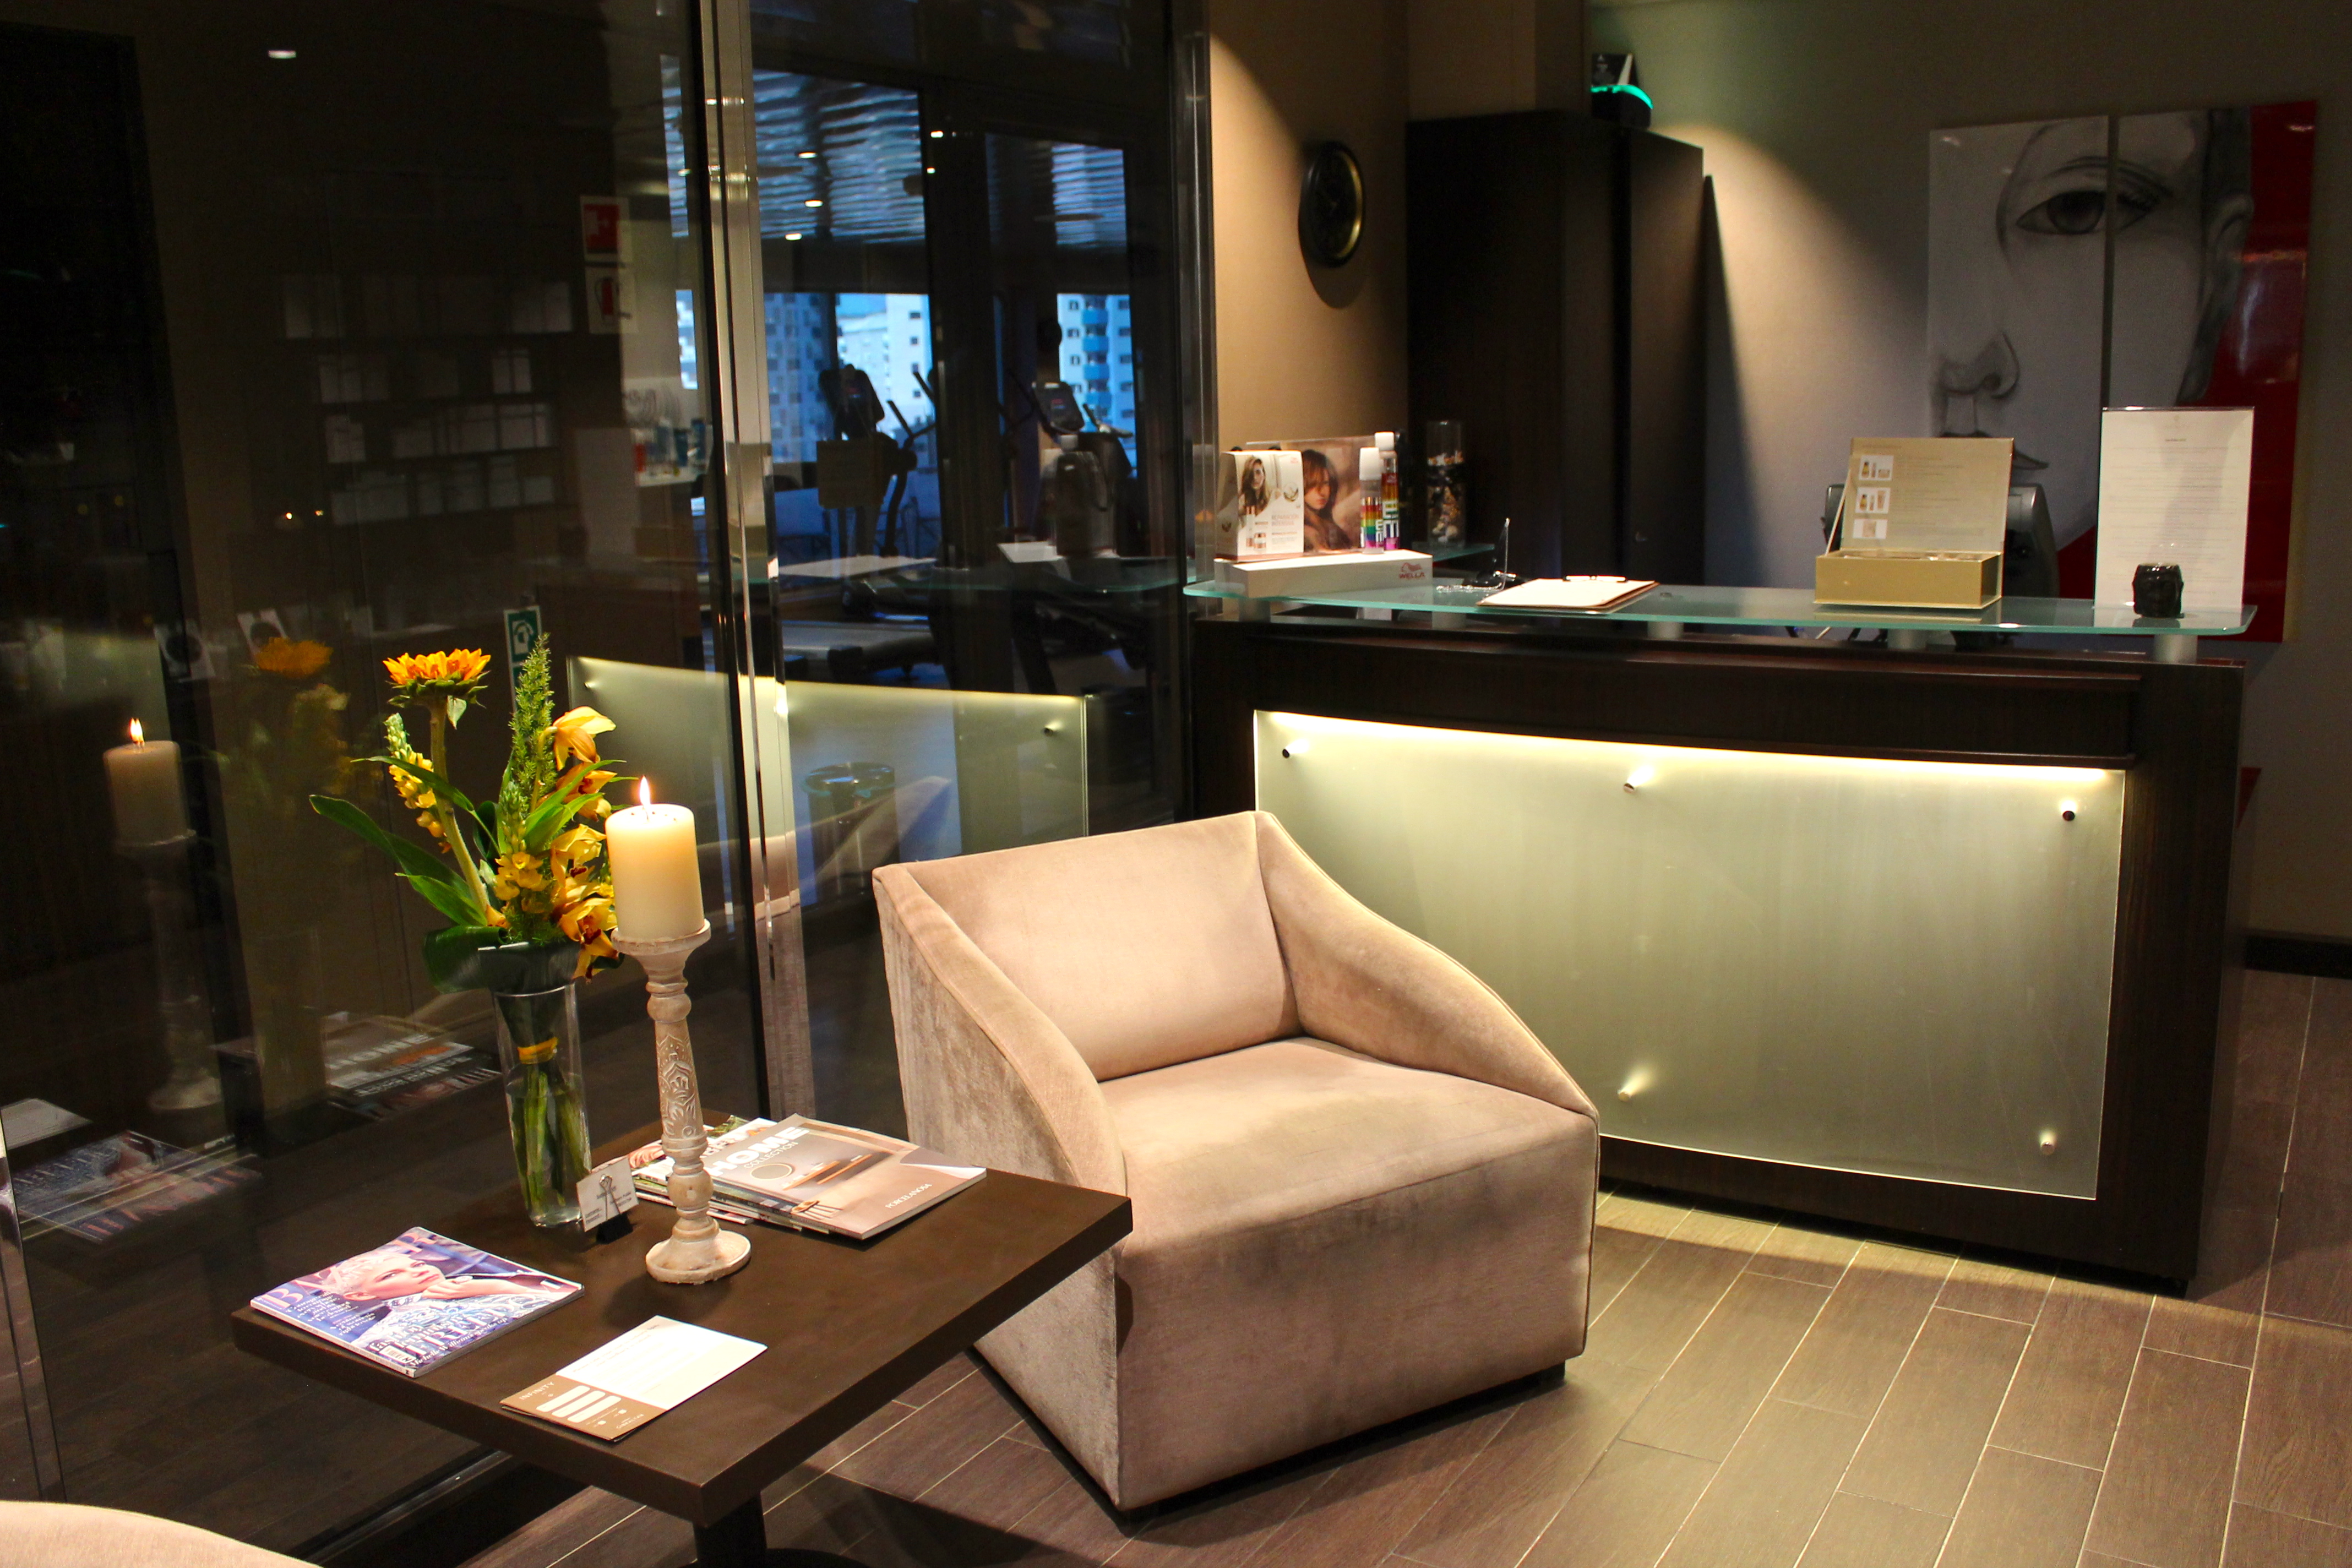 sunborn-hotel-infinity-spa-gibraltar-lustforthesublime